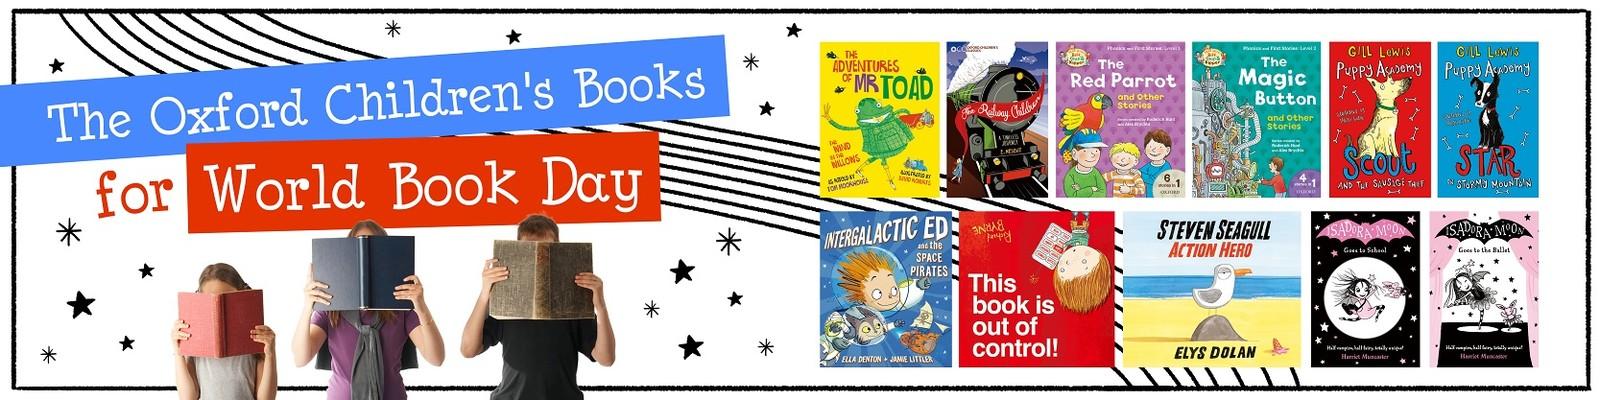 Children's books for World Book Day | Oxford University